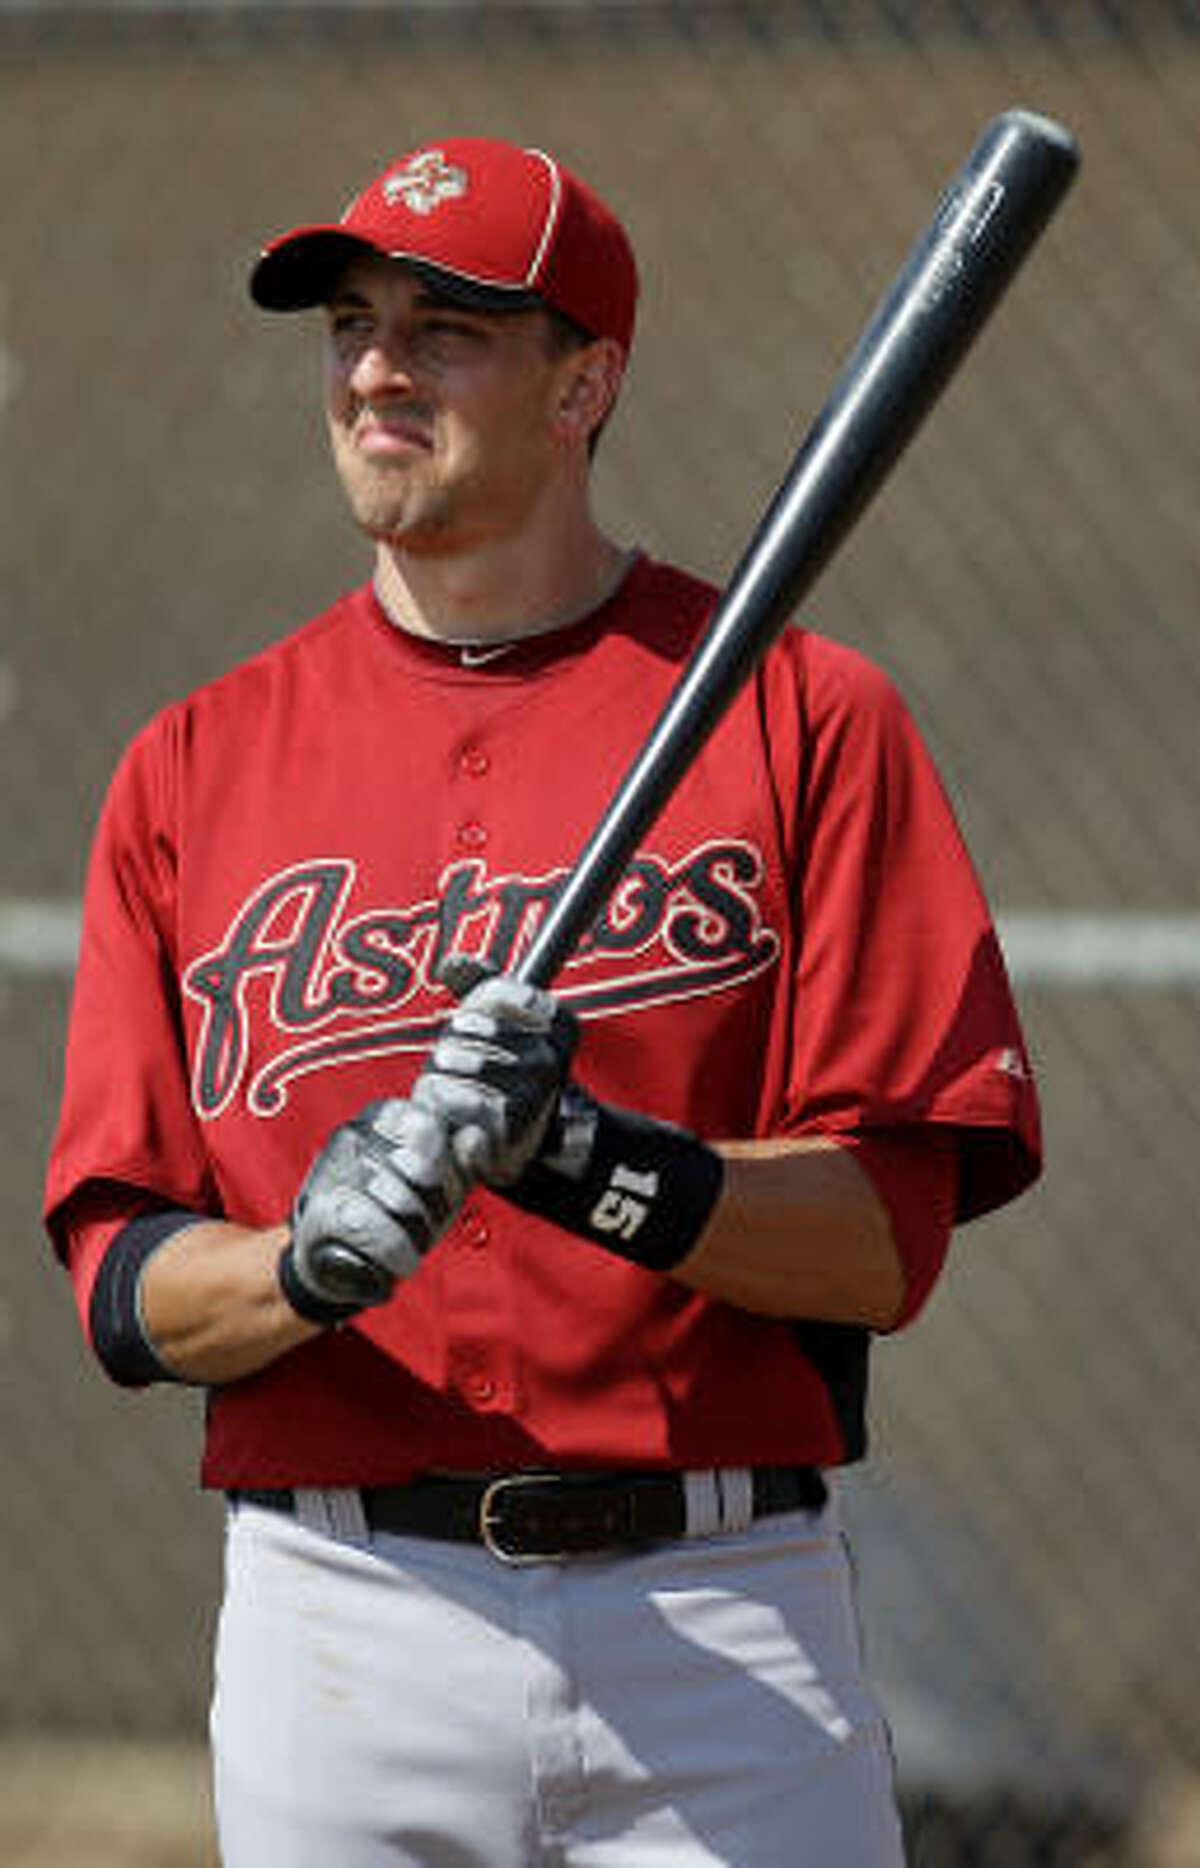 Astros catcher Jason Castro takes batting practice.